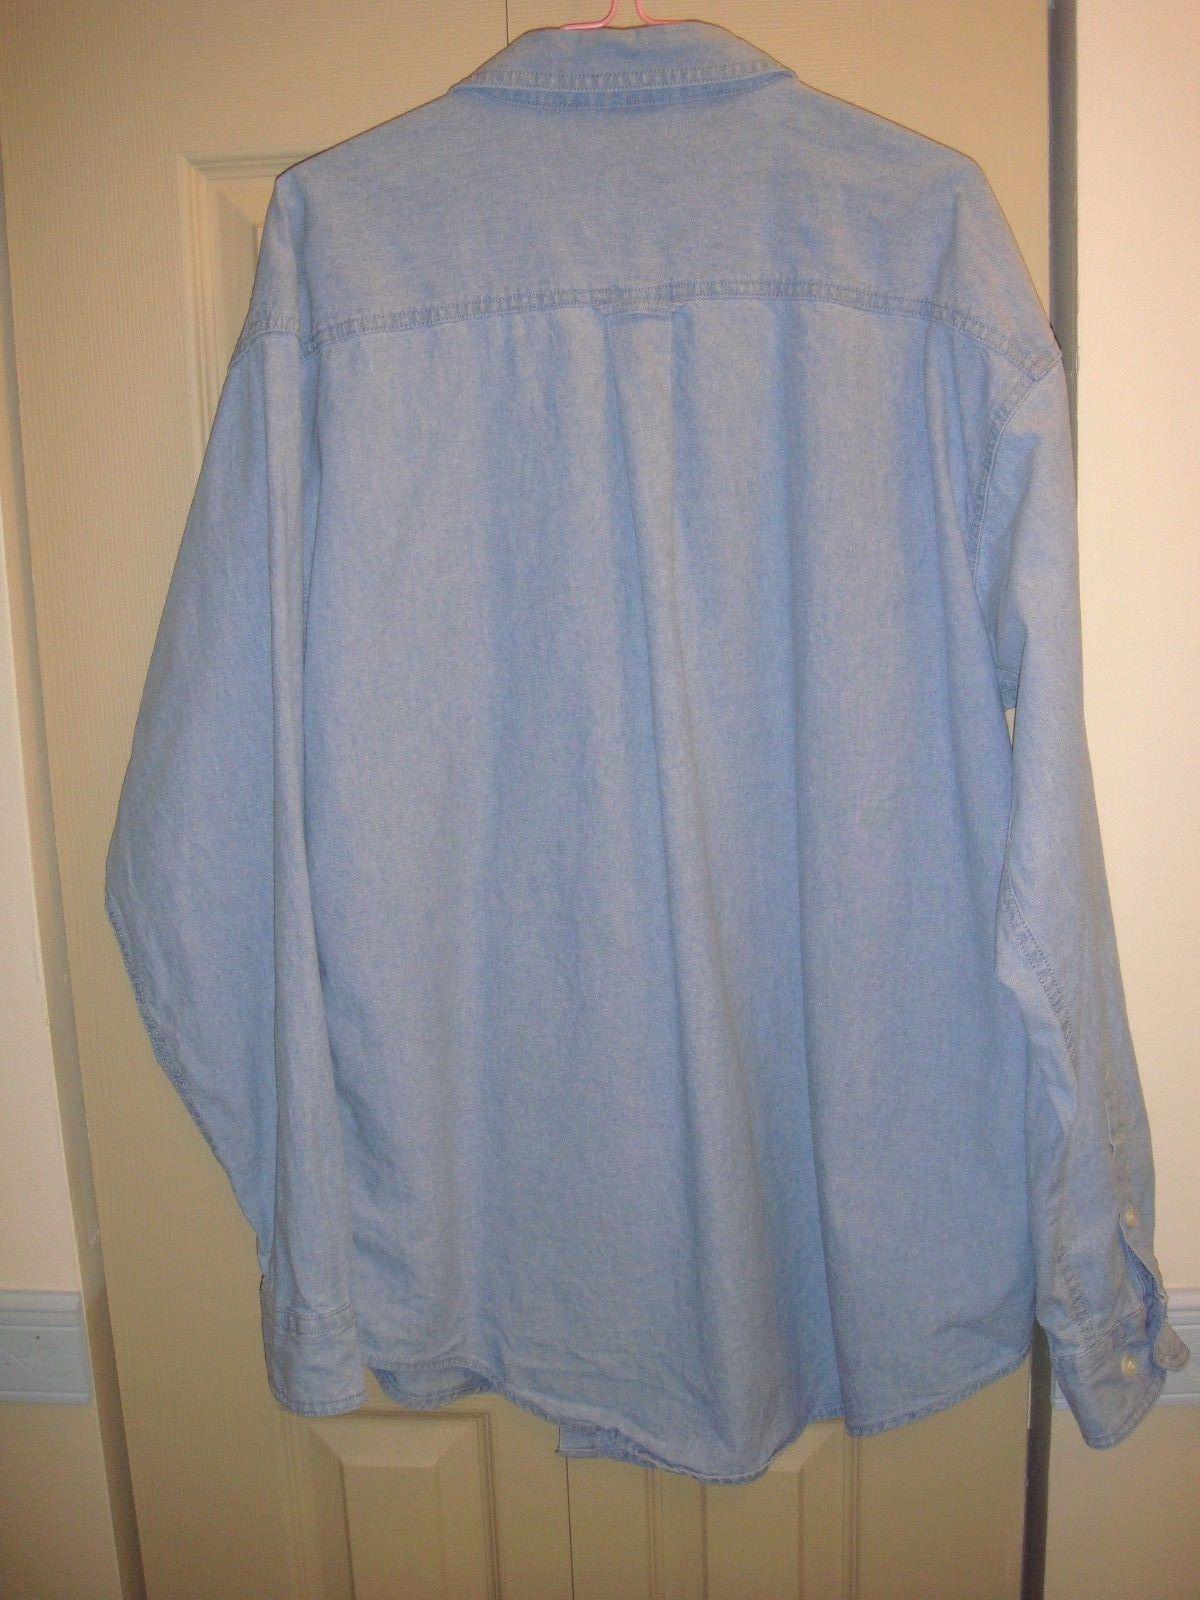 Warner Bros Studio Store Denim Blue Button Down Long Sleeve Shirt Size L